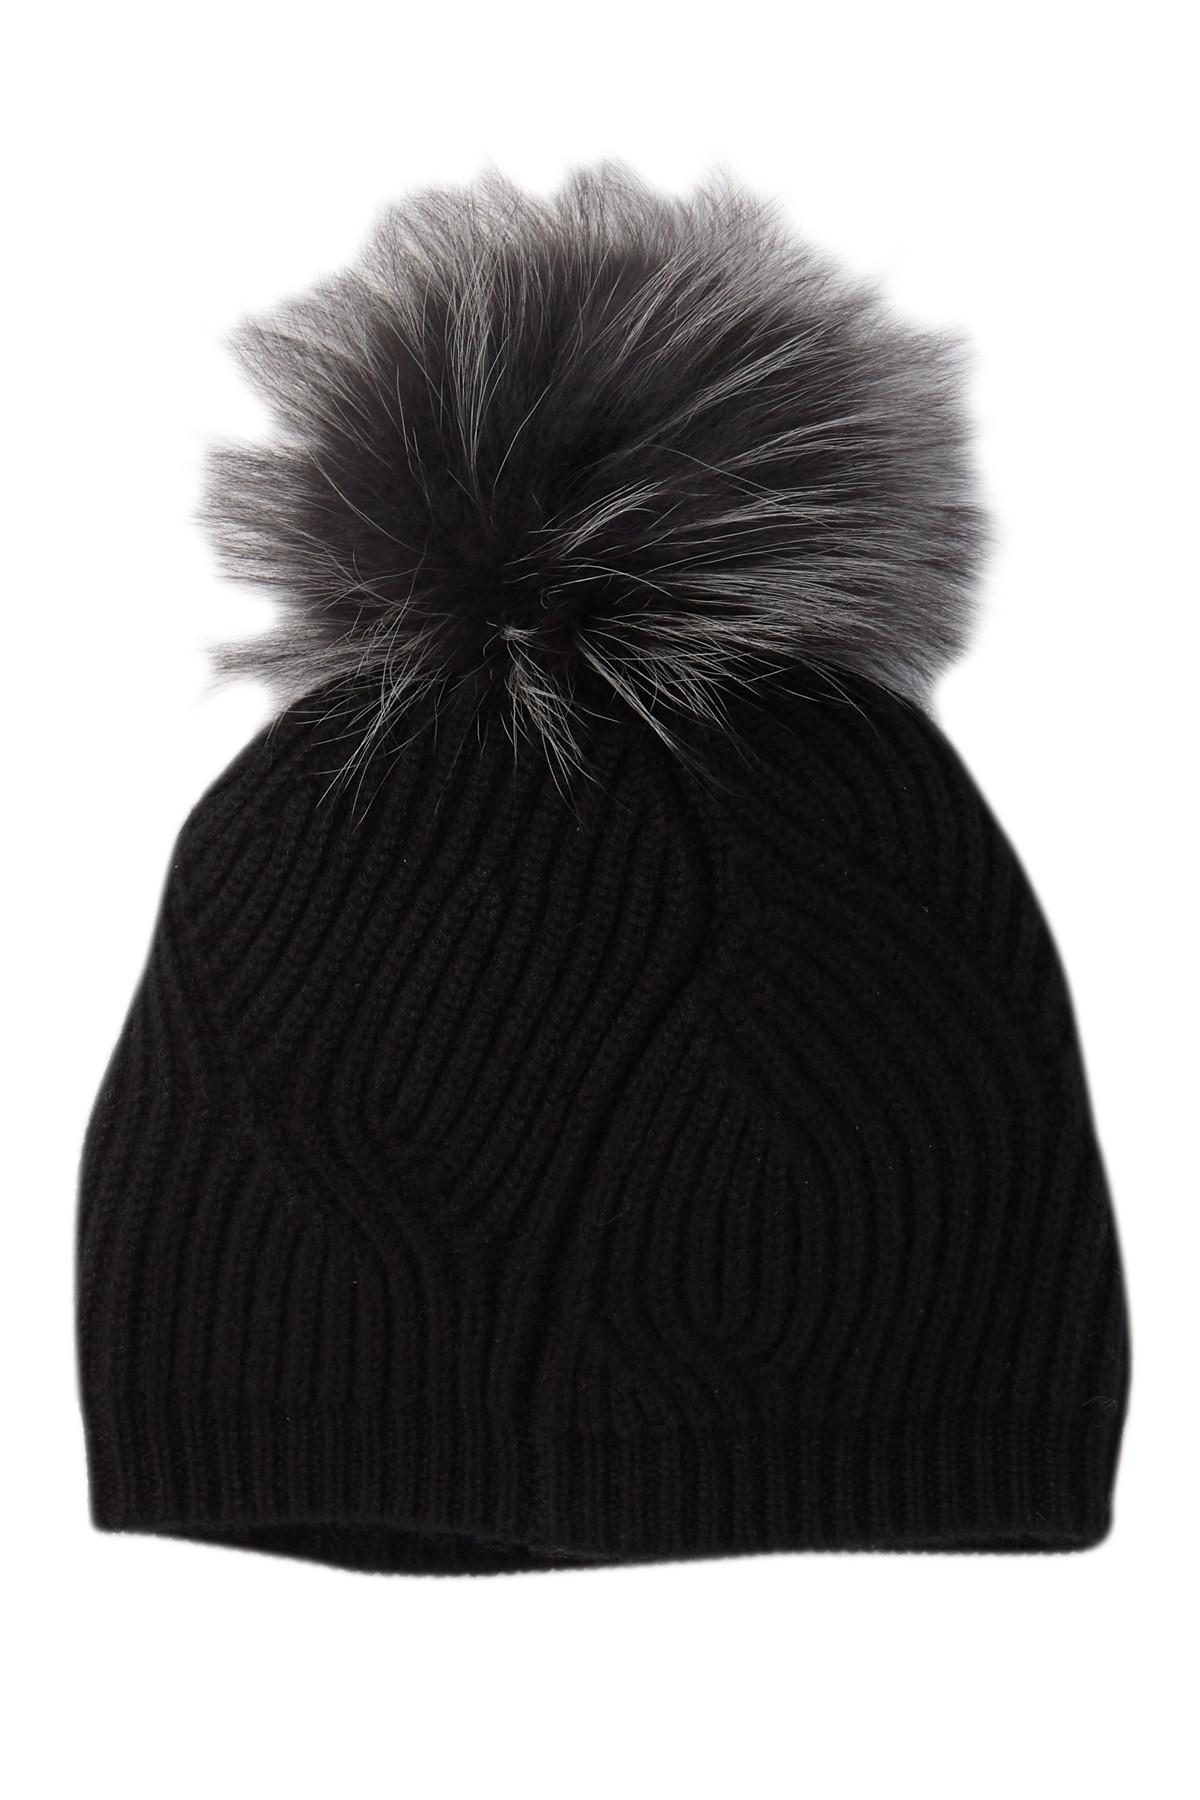 575f9ffd951 Sofia Cashmere. Women s Black Textured Ribbed Knit Beanie With Fur Pompom